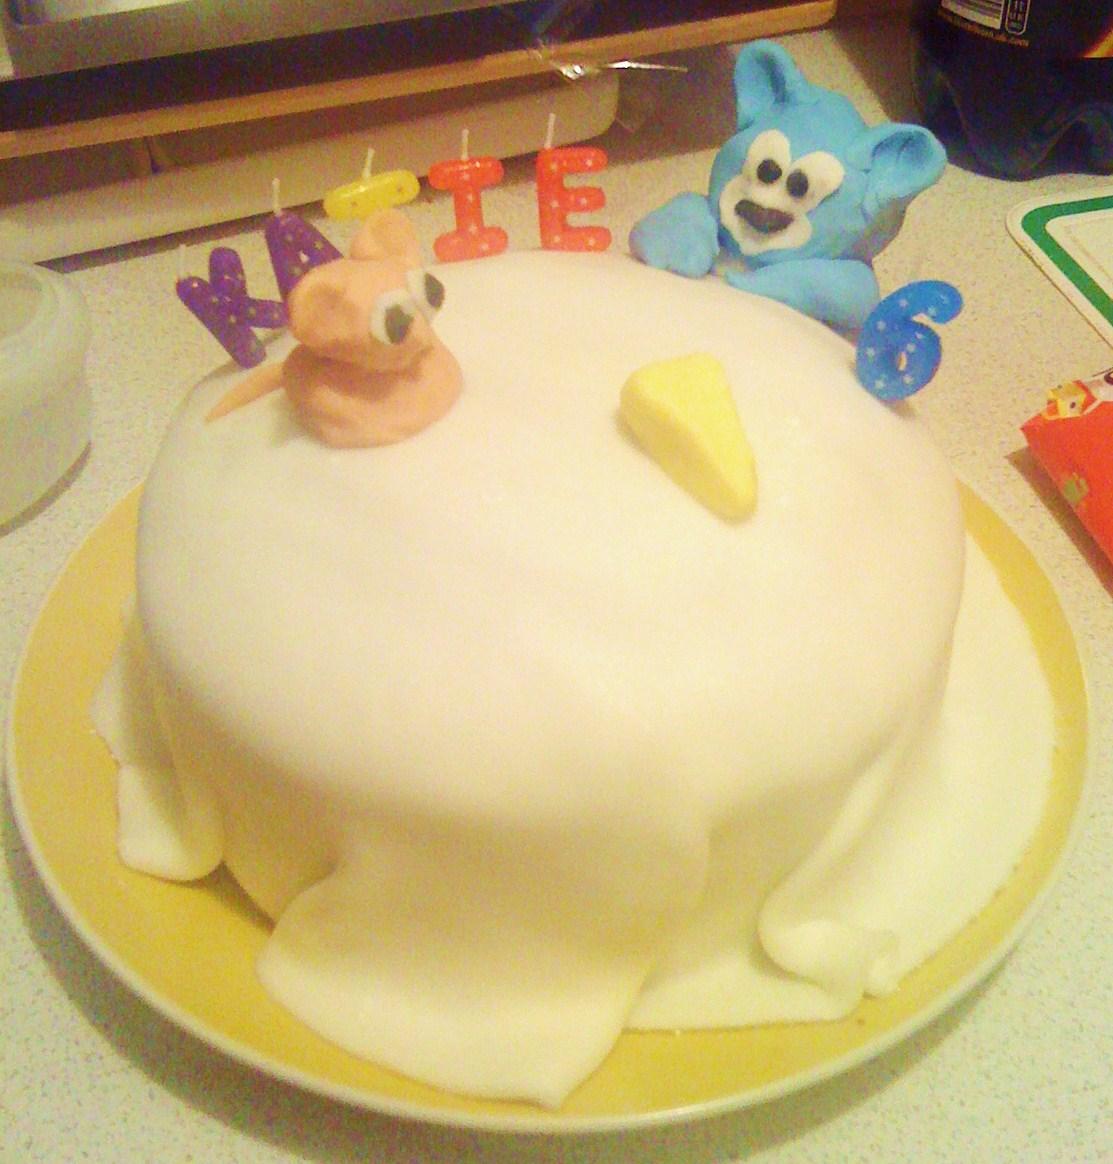 Kitchen Design Cake: Whitethorn Farmhouse Kitchen: Cake Designs